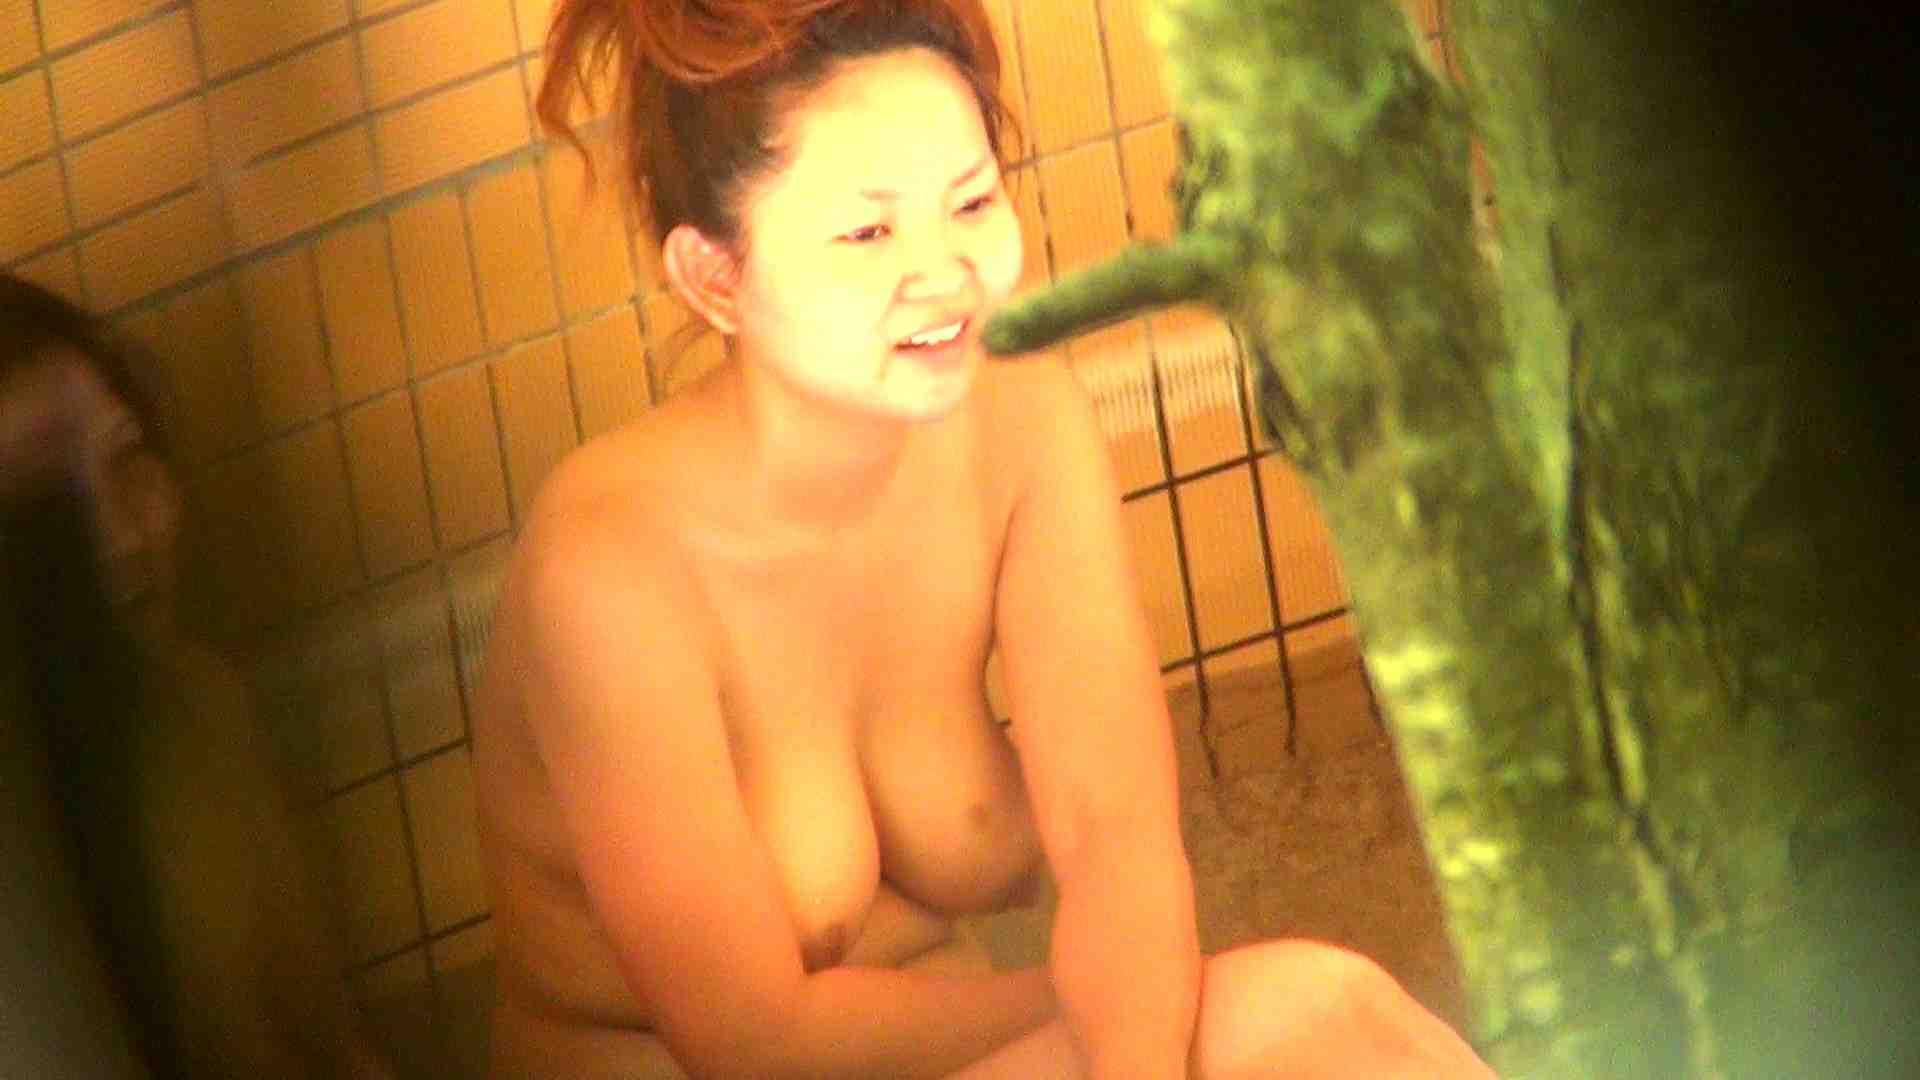 Vol.37 オデブと妊婦とokaasann 露天   美女のボディ  69PIX 61